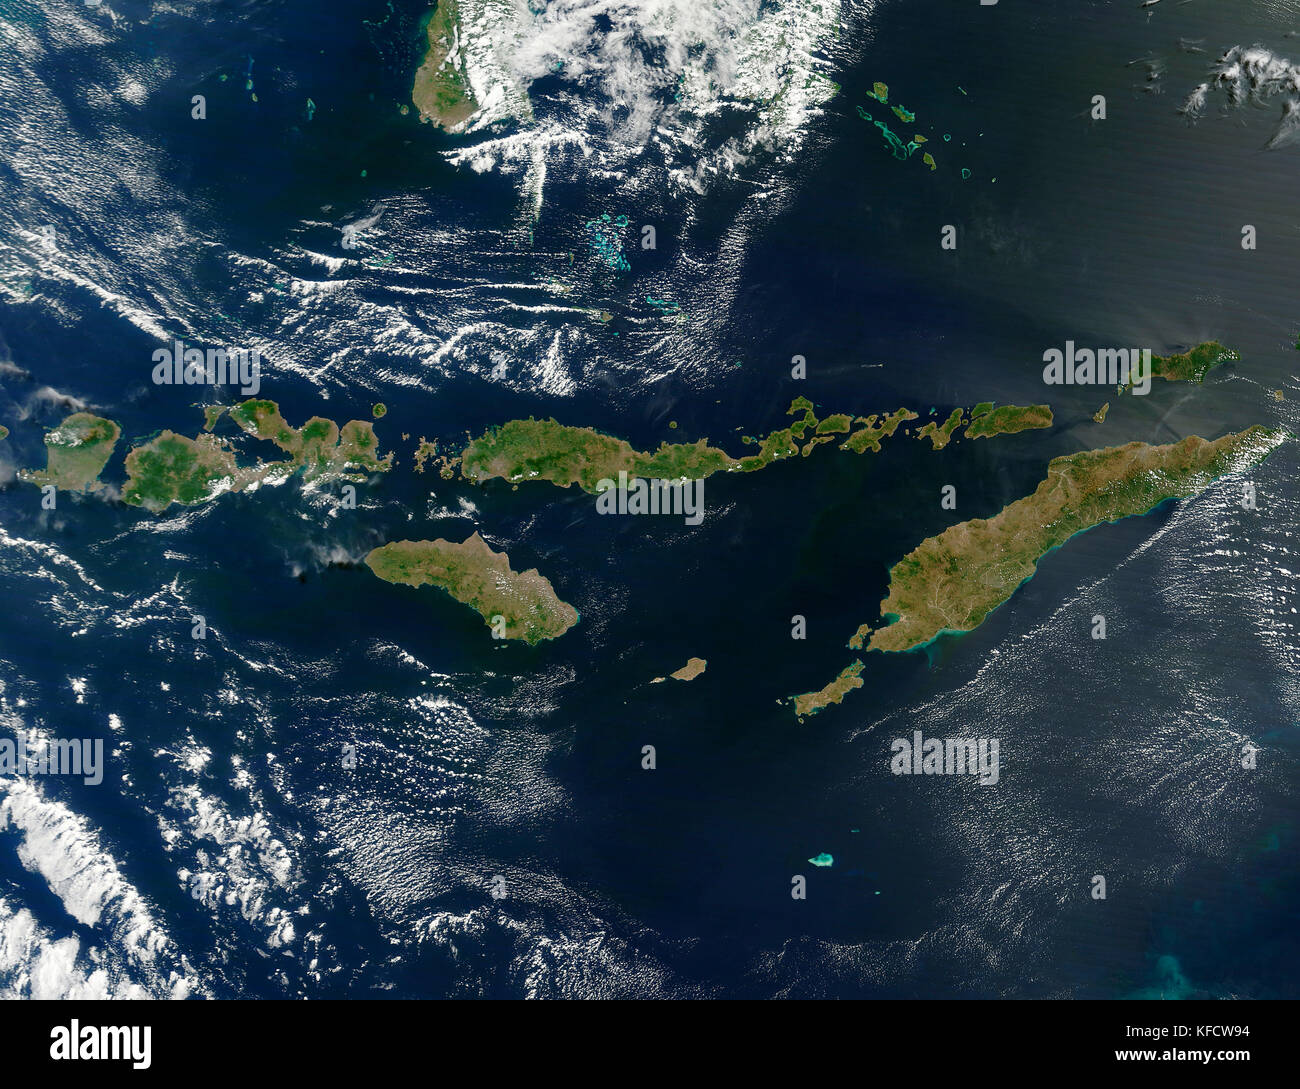 Aerial of the Lesser Sunda Islands - Stock Image